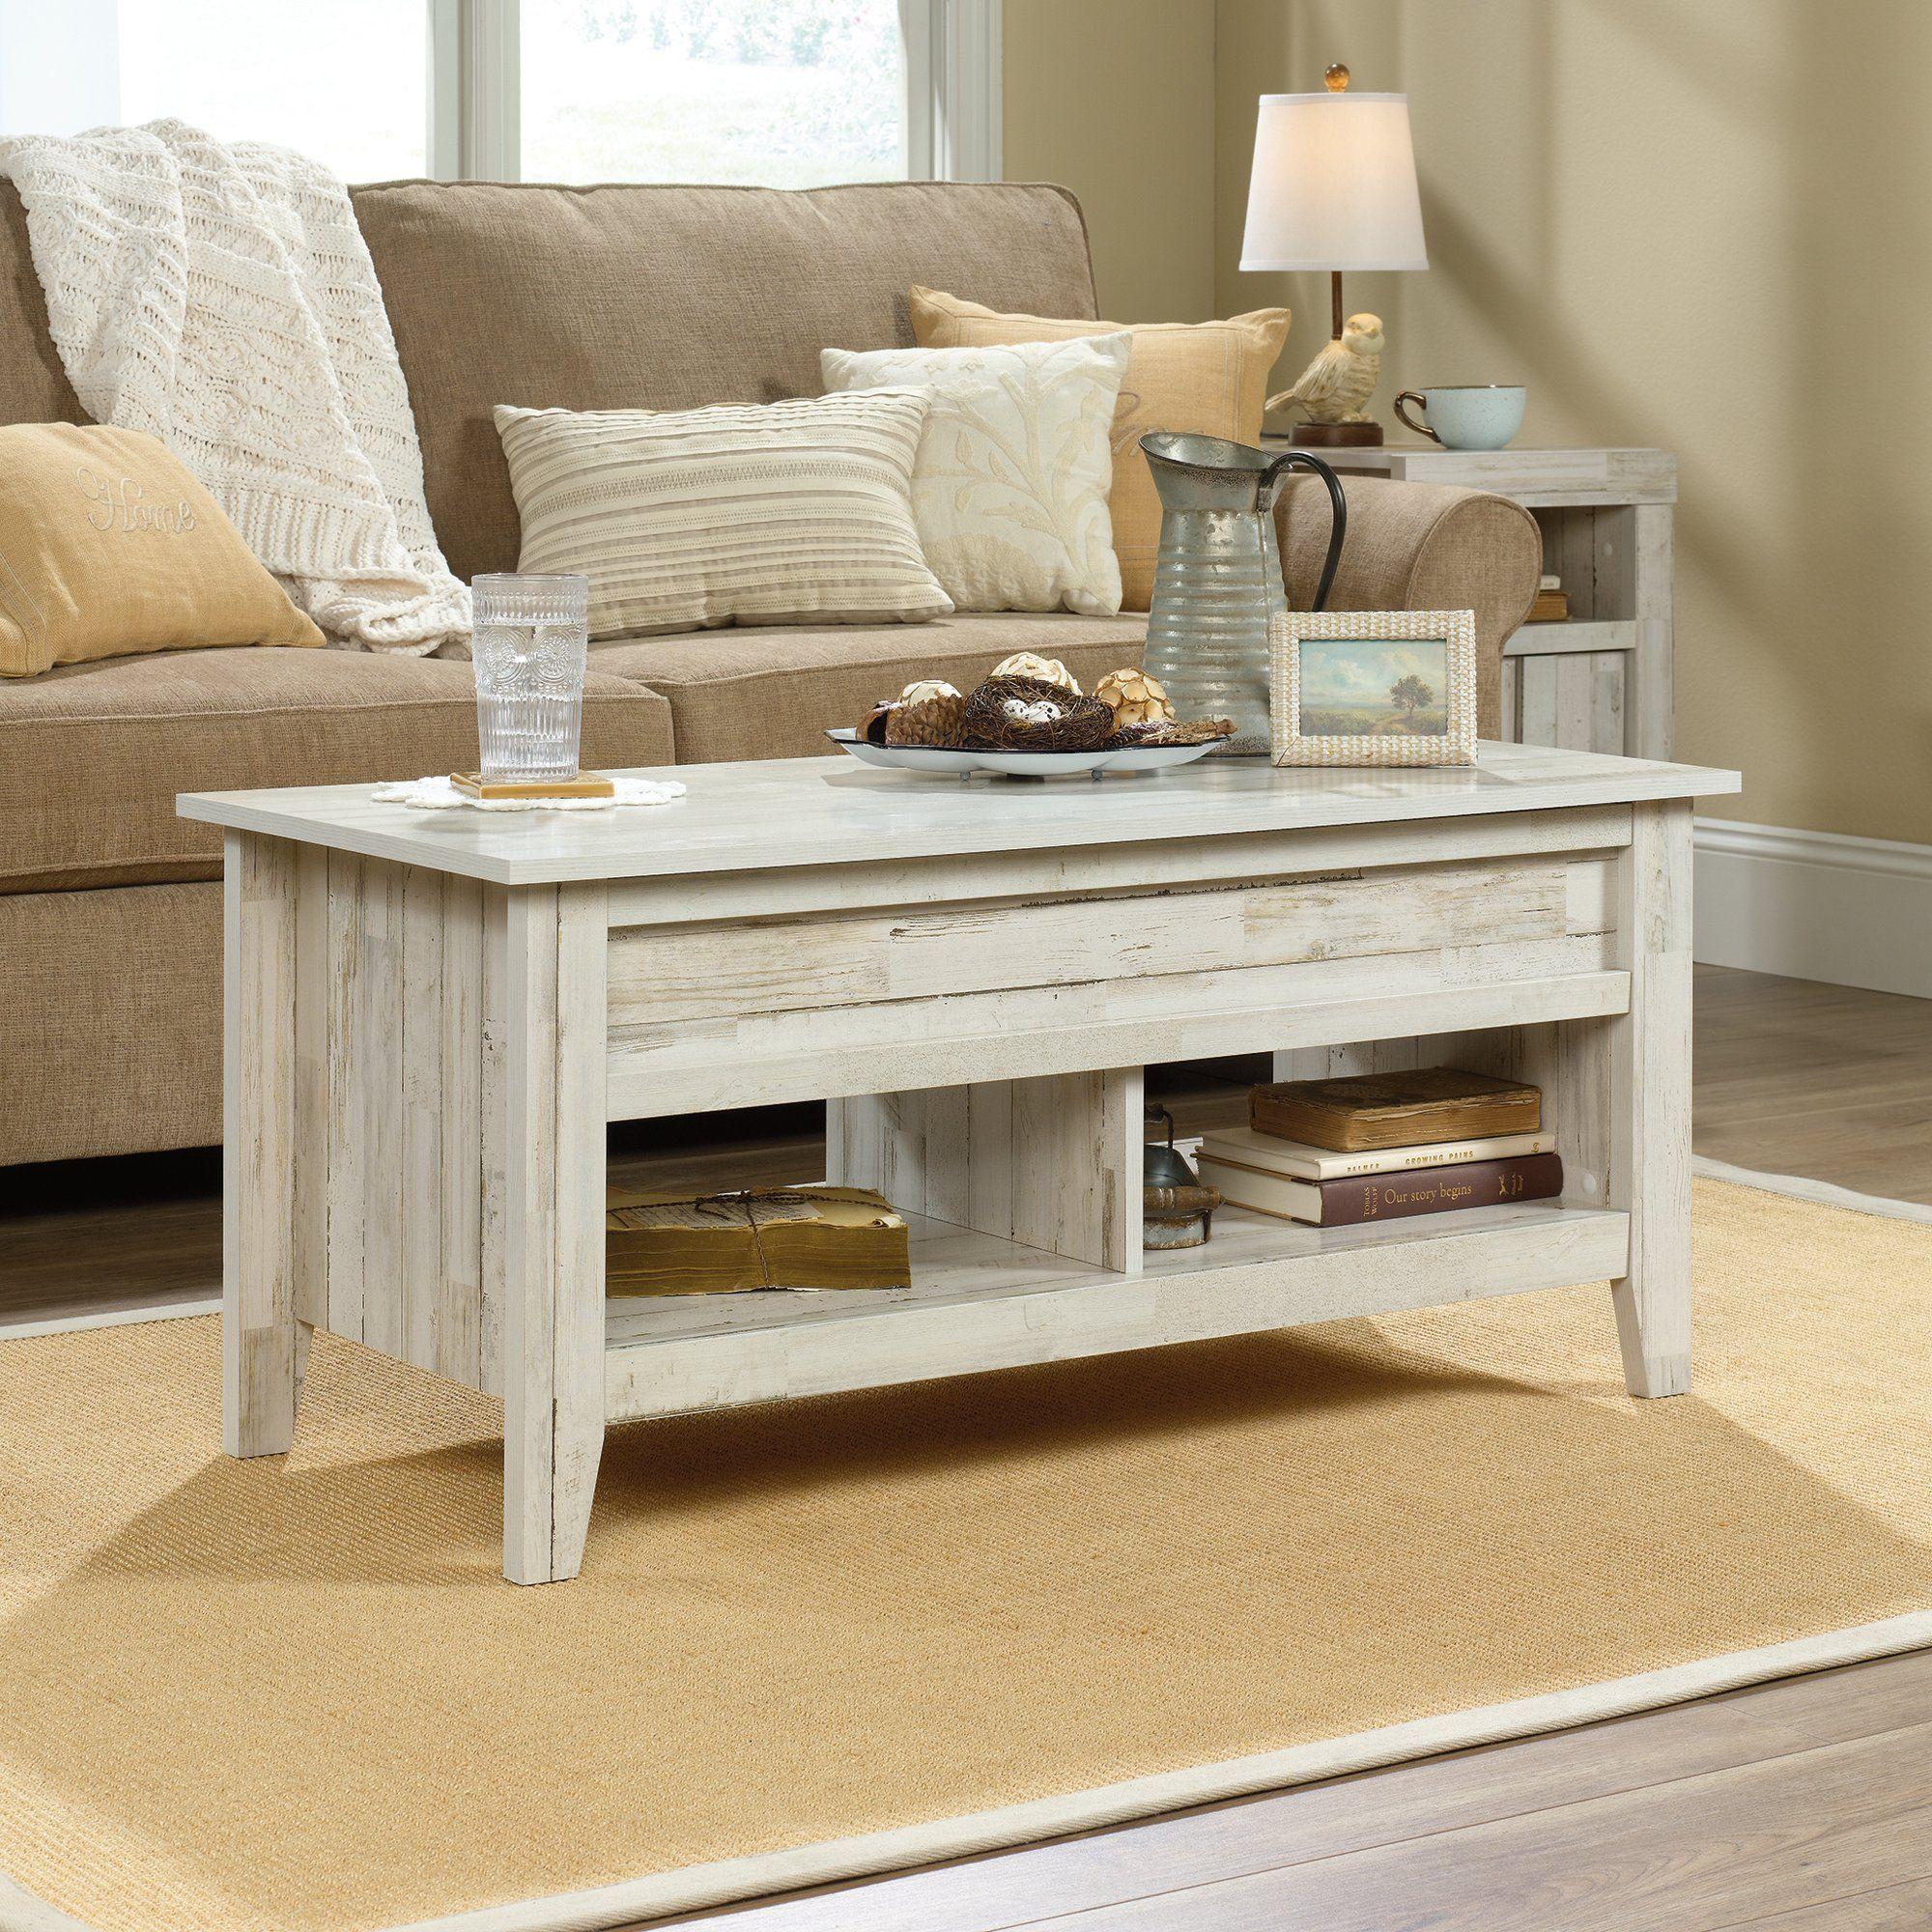 Sauder Dakota Pass Lift Top Coffee Table White Plank Finish Walmart Com Walmart Com In 2021 Coffee Table With Storage Coffee Table Living Room Coffee Table [ 2000 x 2000 Pixel ]